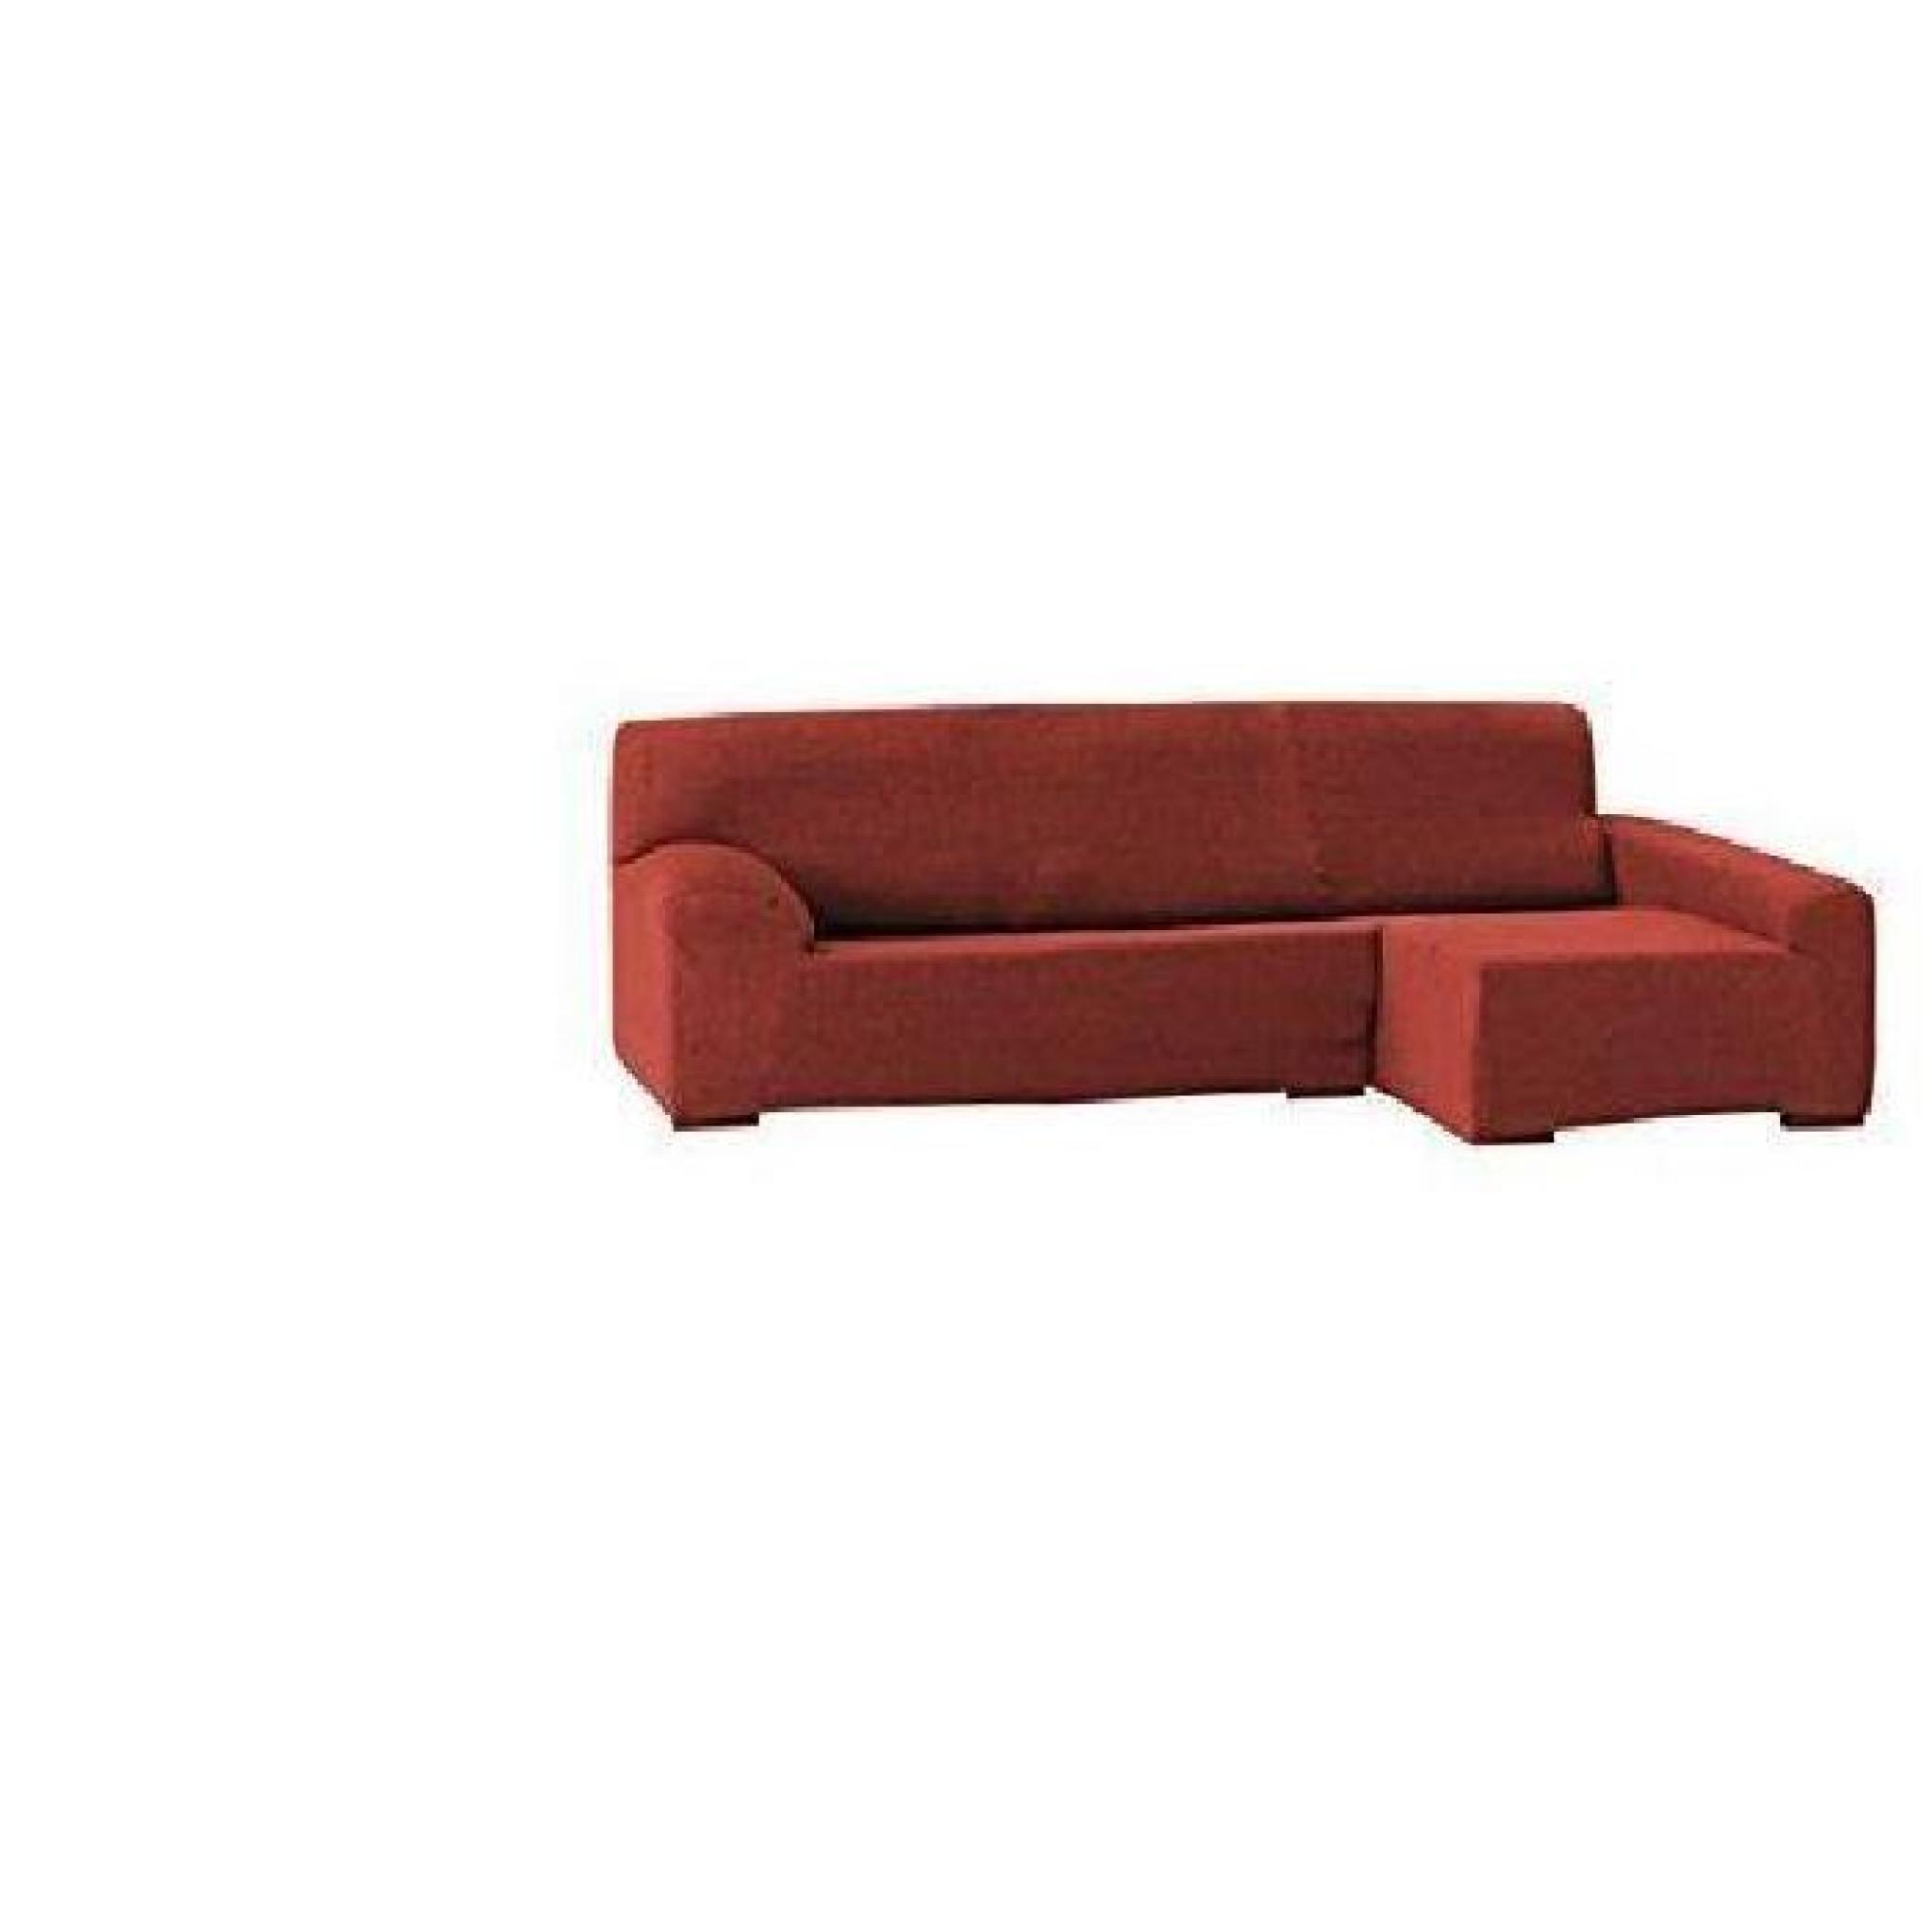 eysa f033469d teide chaise longue droite vue frontale coton polyester elastom re orange 44 x 38. Black Bedroom Furniture Sets. Home Design Ideas